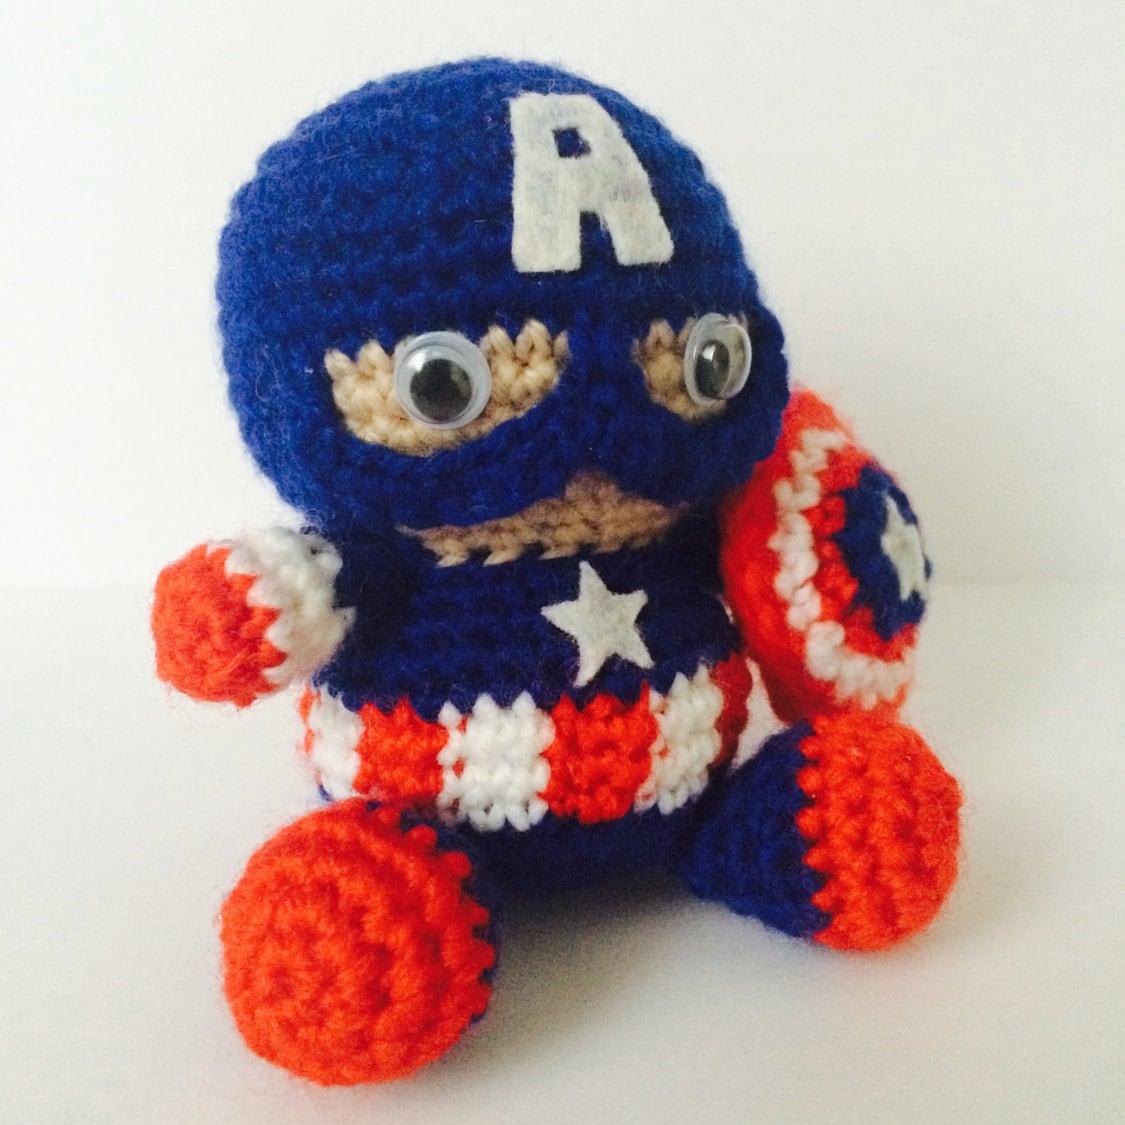 Captain AMERICA Muster Amigurumi Superhelden Rächer Schild